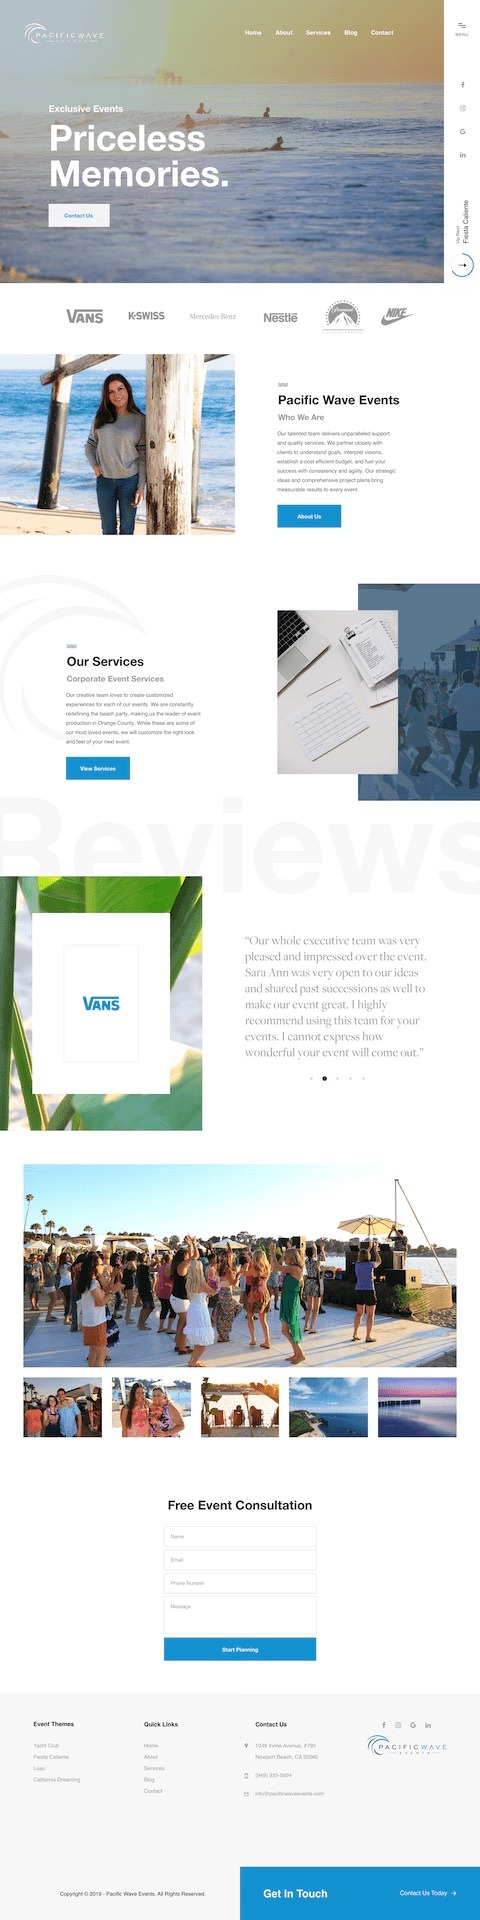 Dorian Media - creative website designer